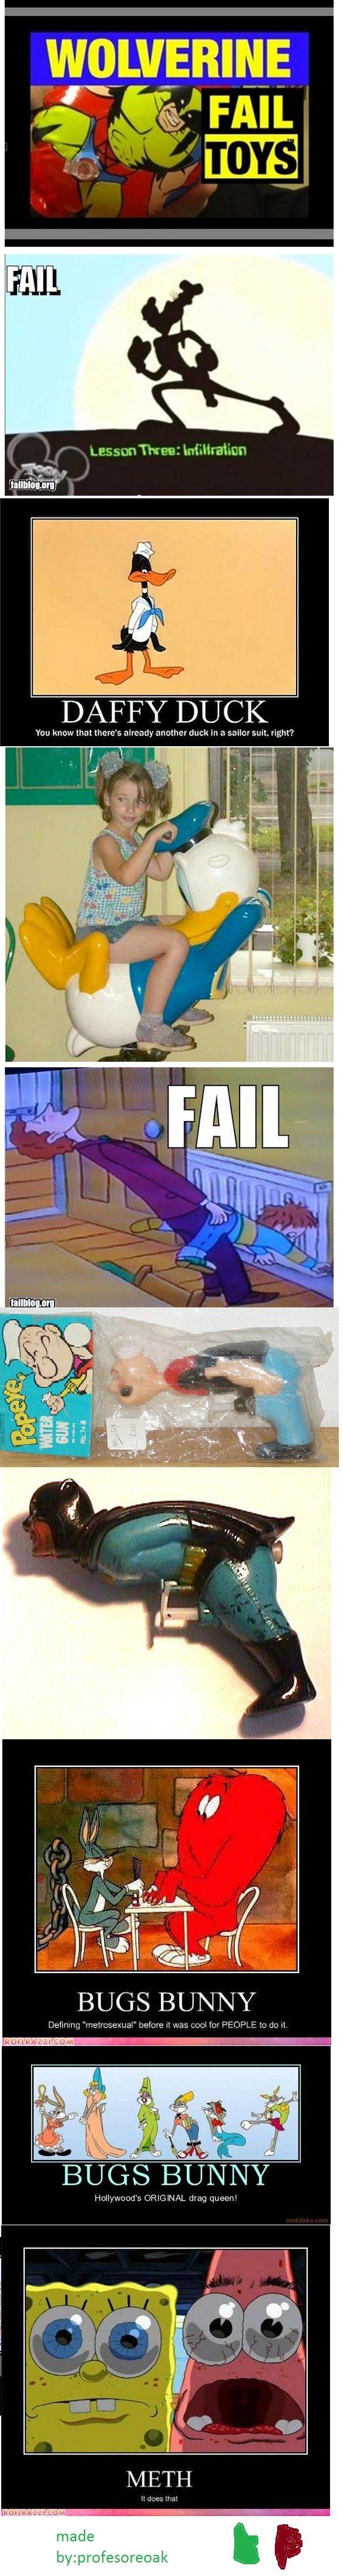 fail toys. not myn just found and complied. Vyq_ ._ EPINI byz profesoreoak E Sc